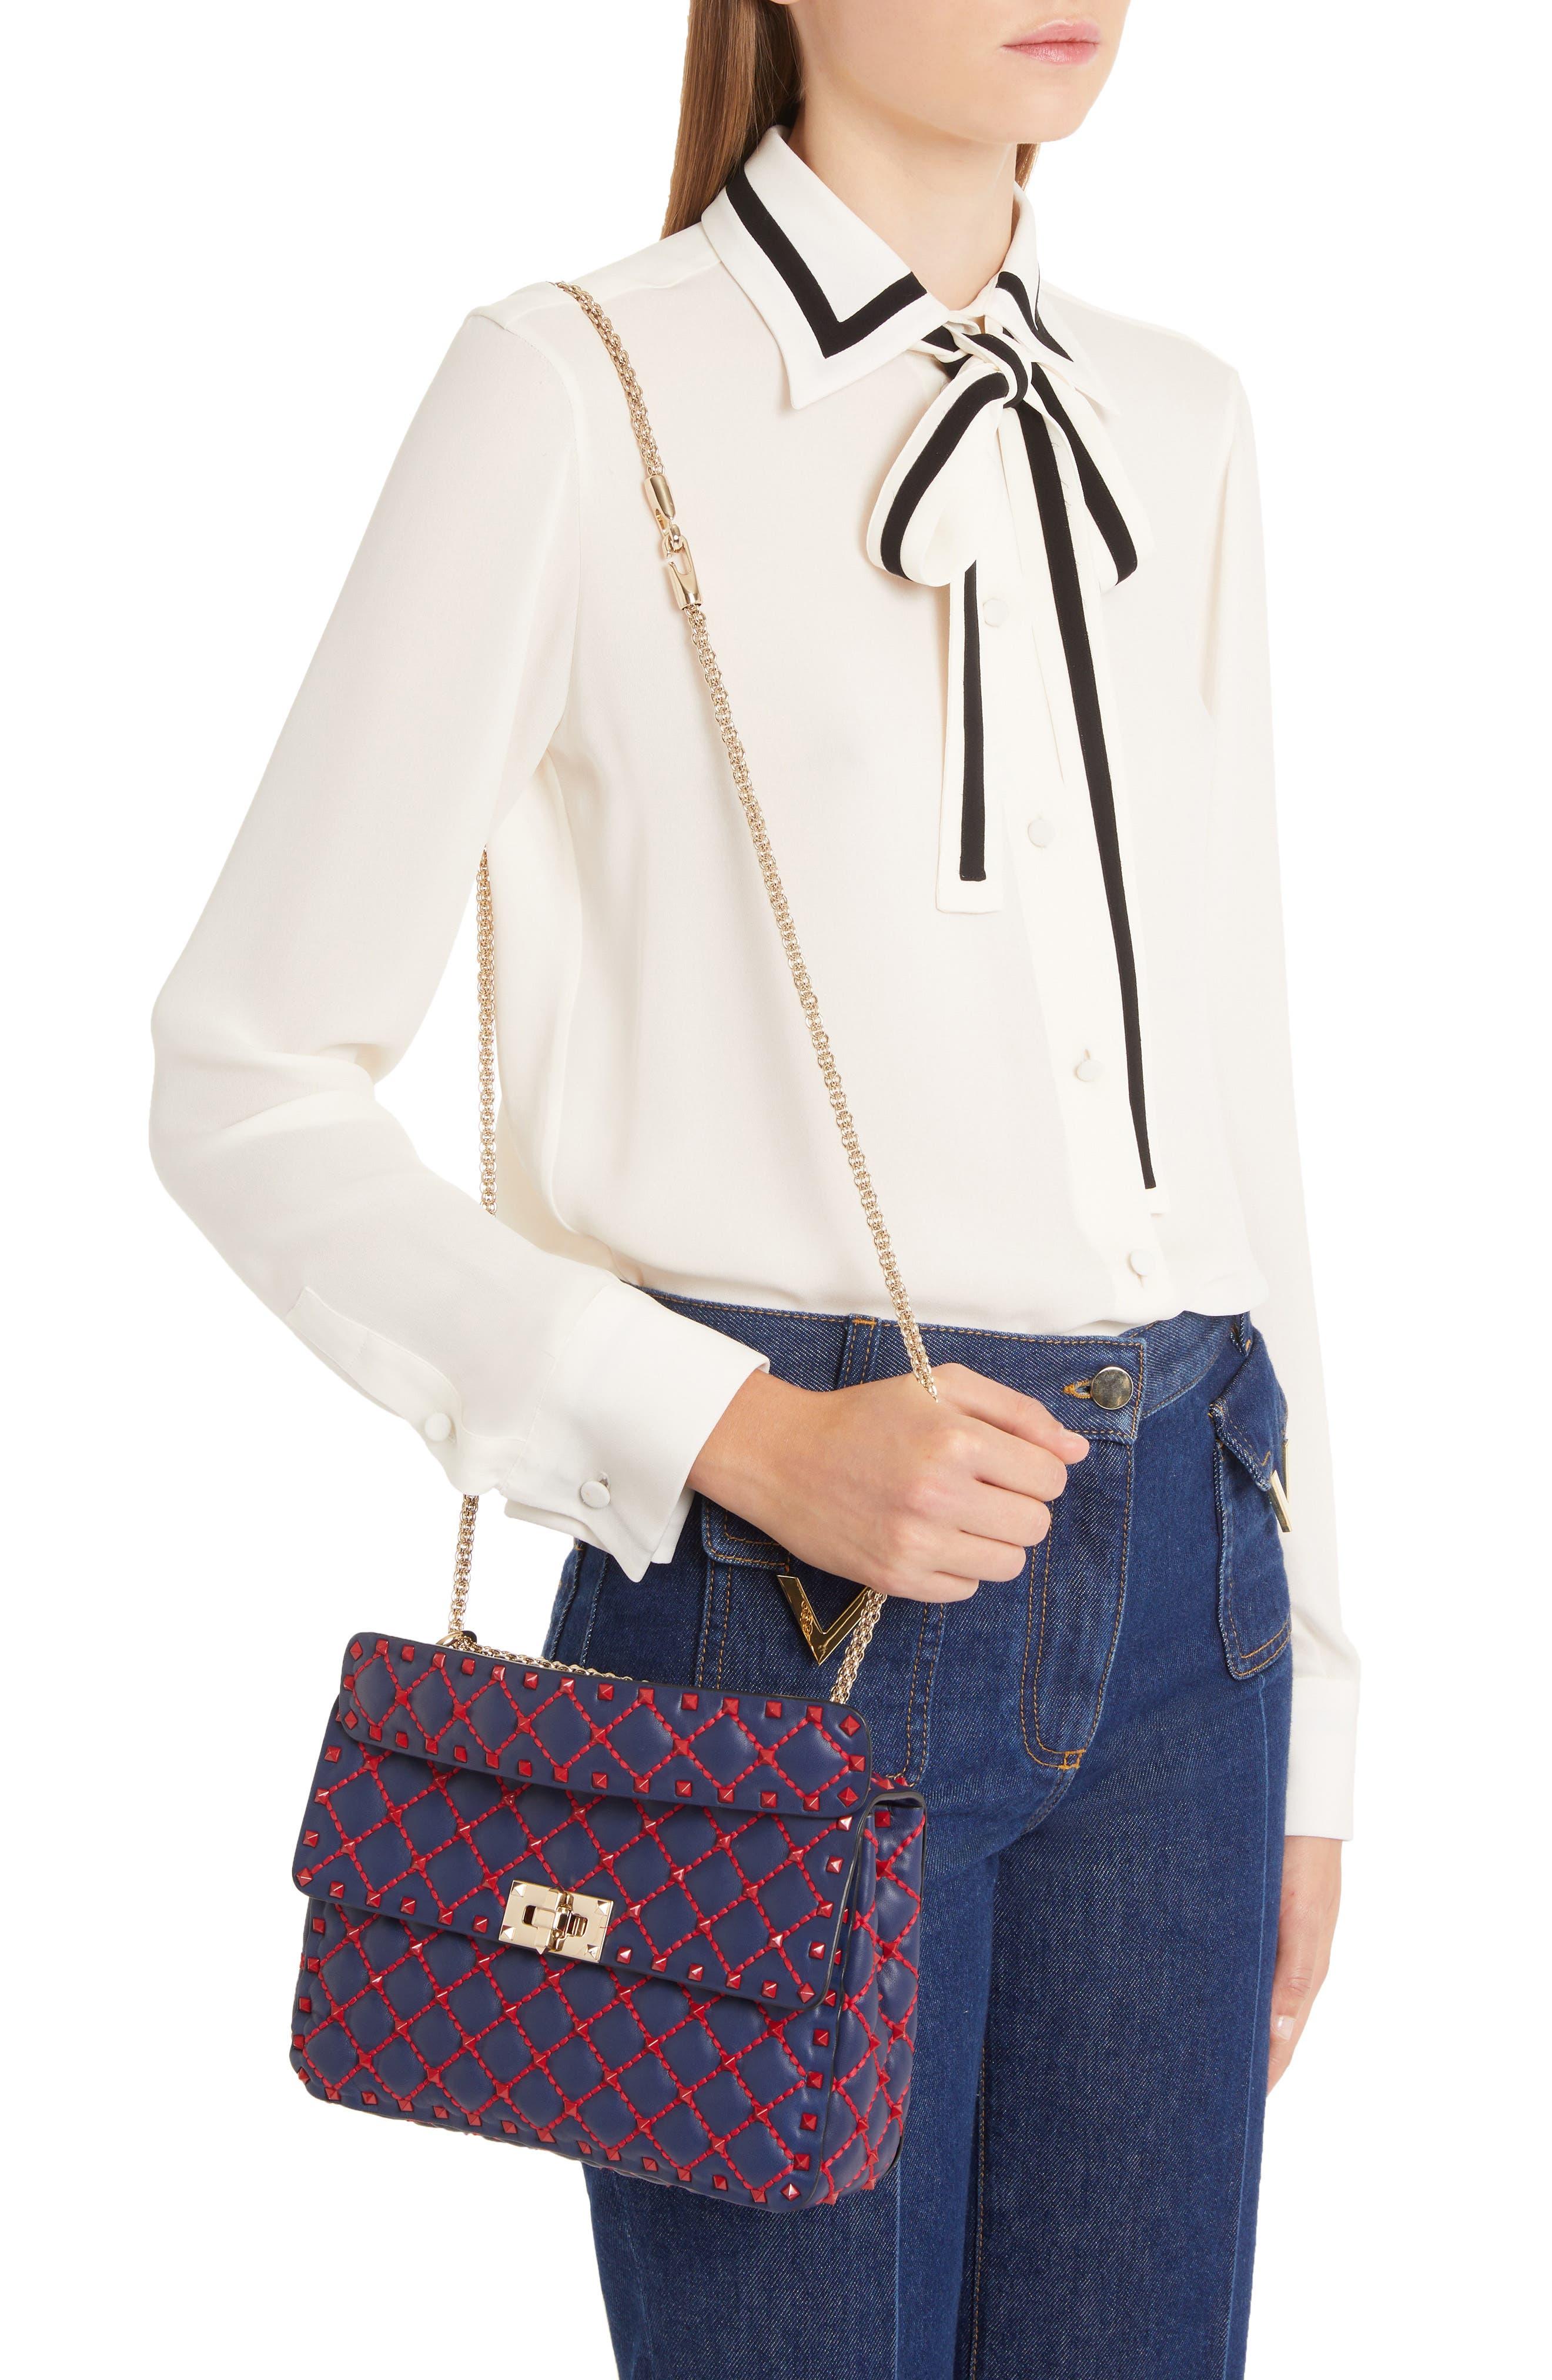 Medium Spike.It Leather Shoulder Bag,                             Alternate thumbnail 2, color,                             PURE BLUE/ ROSSO